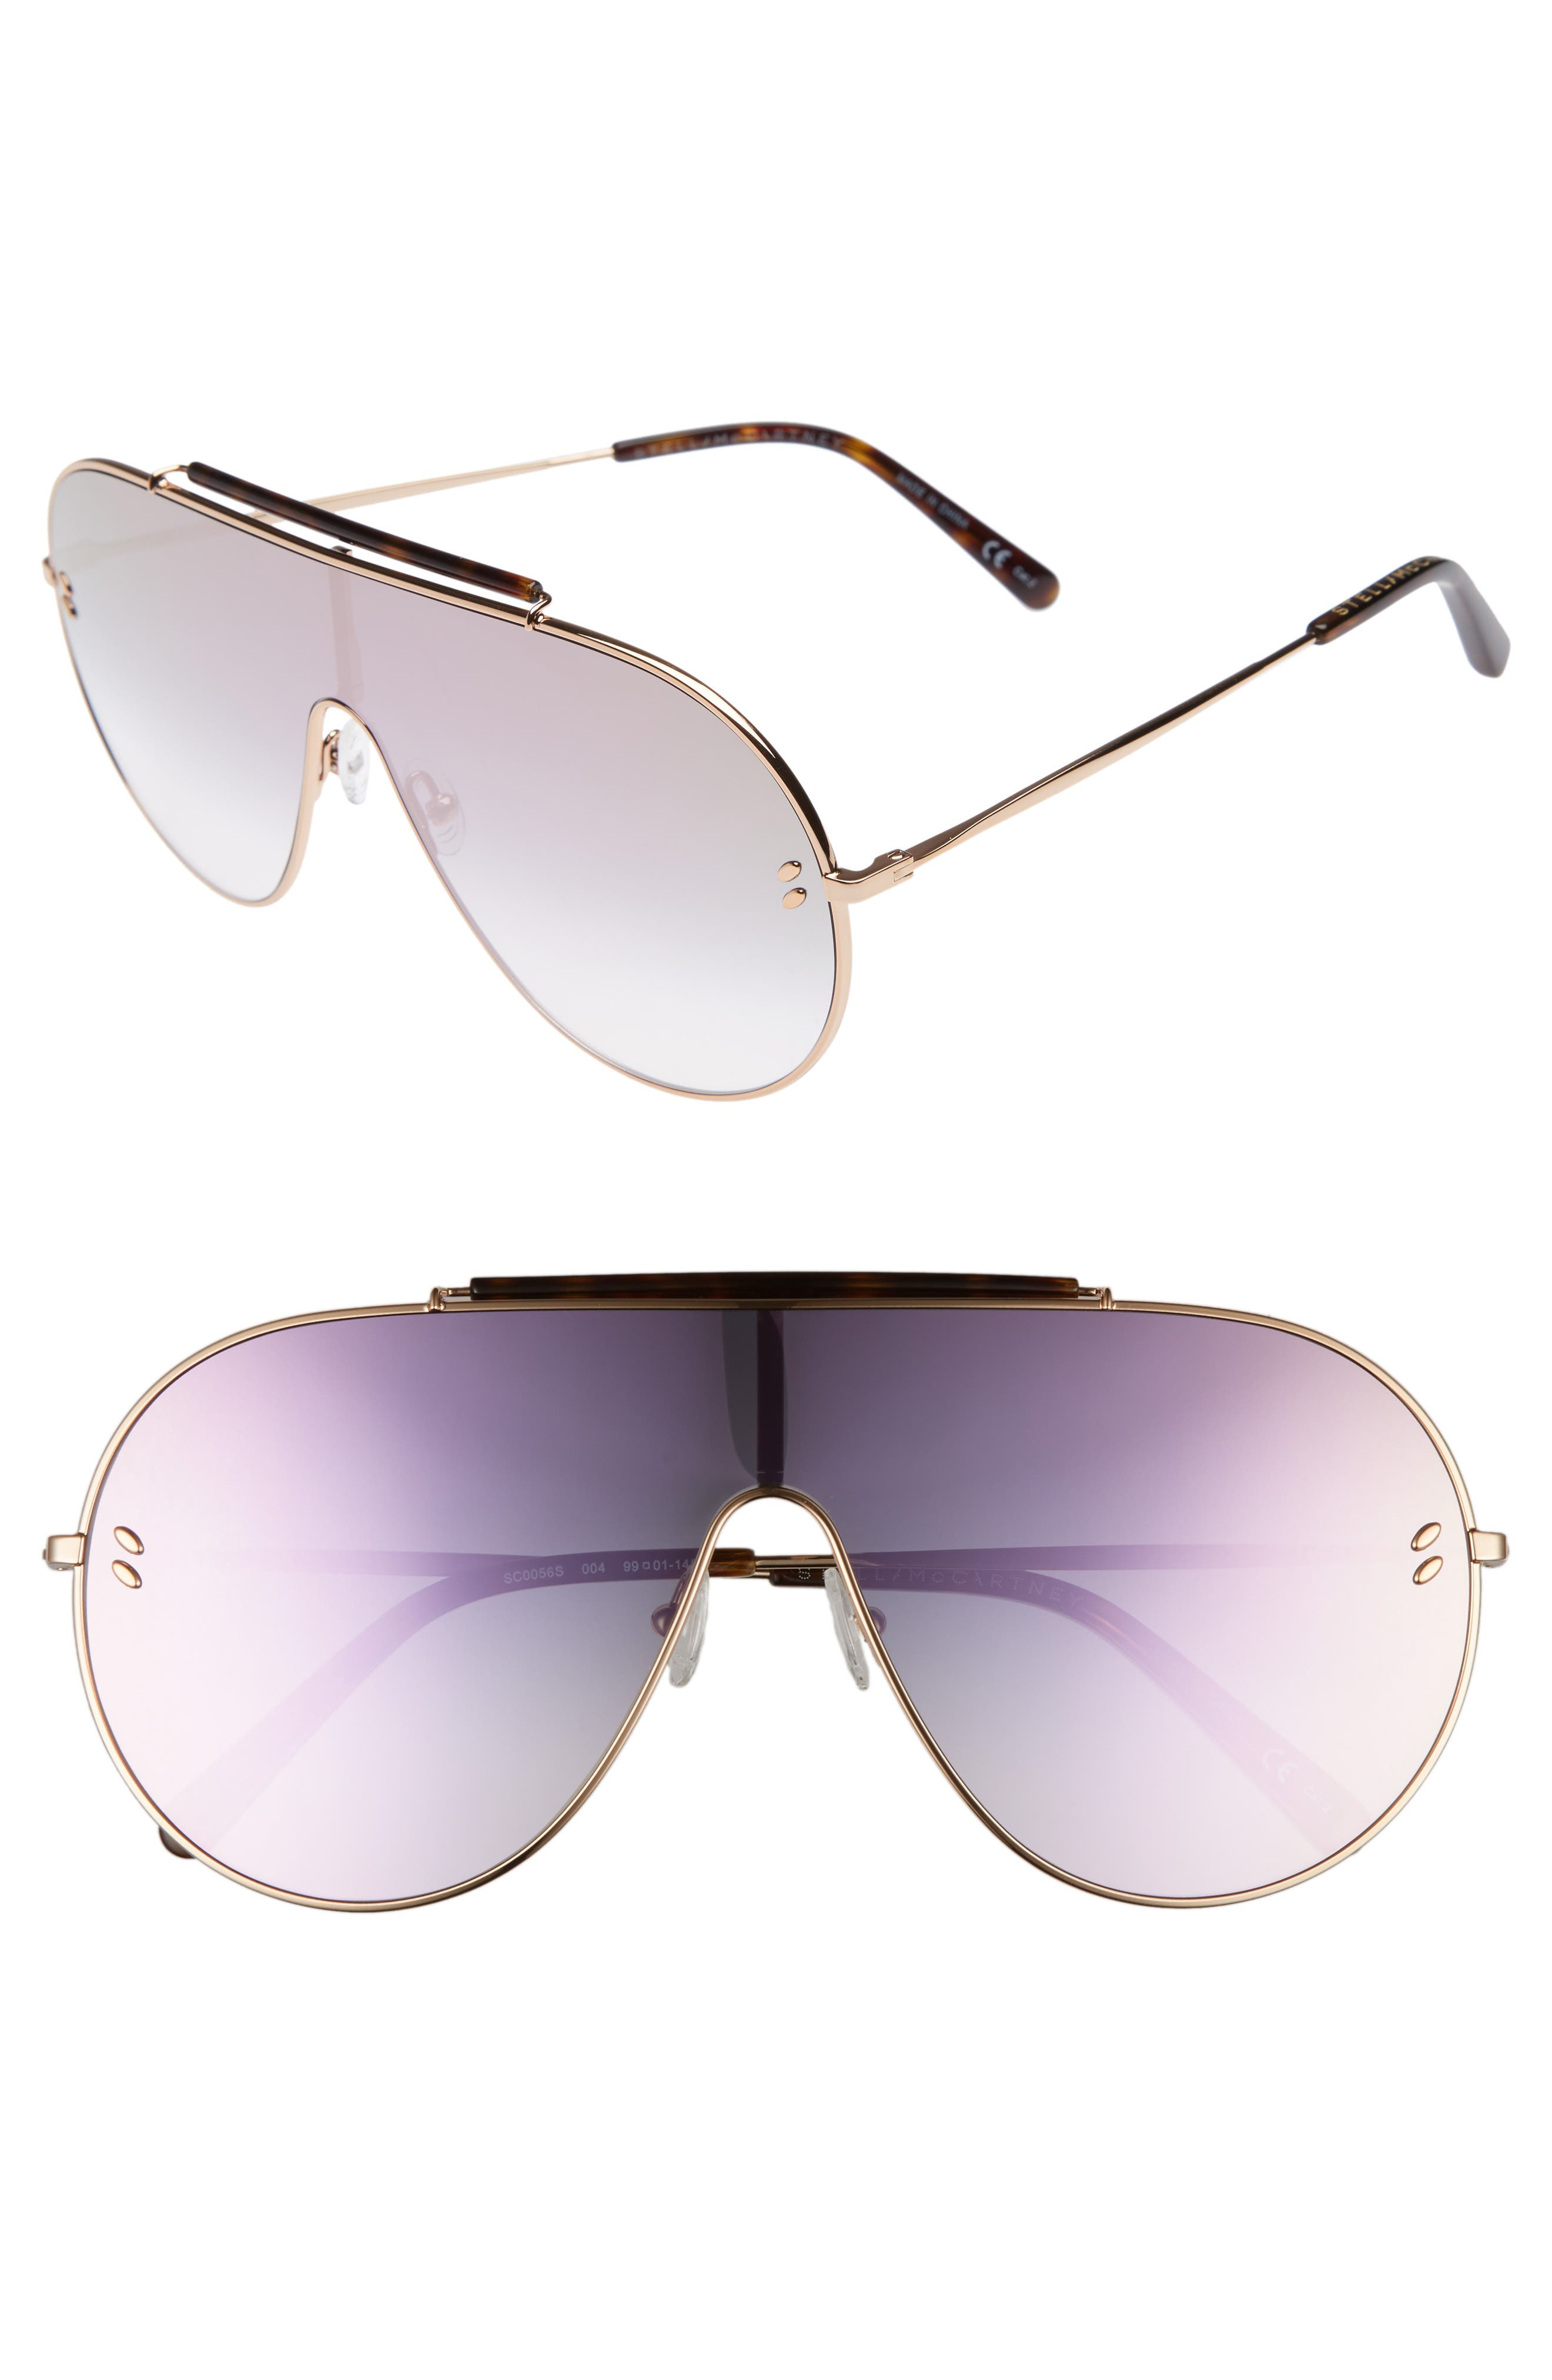 Stella McCartney 65mm Shield Sunglasses